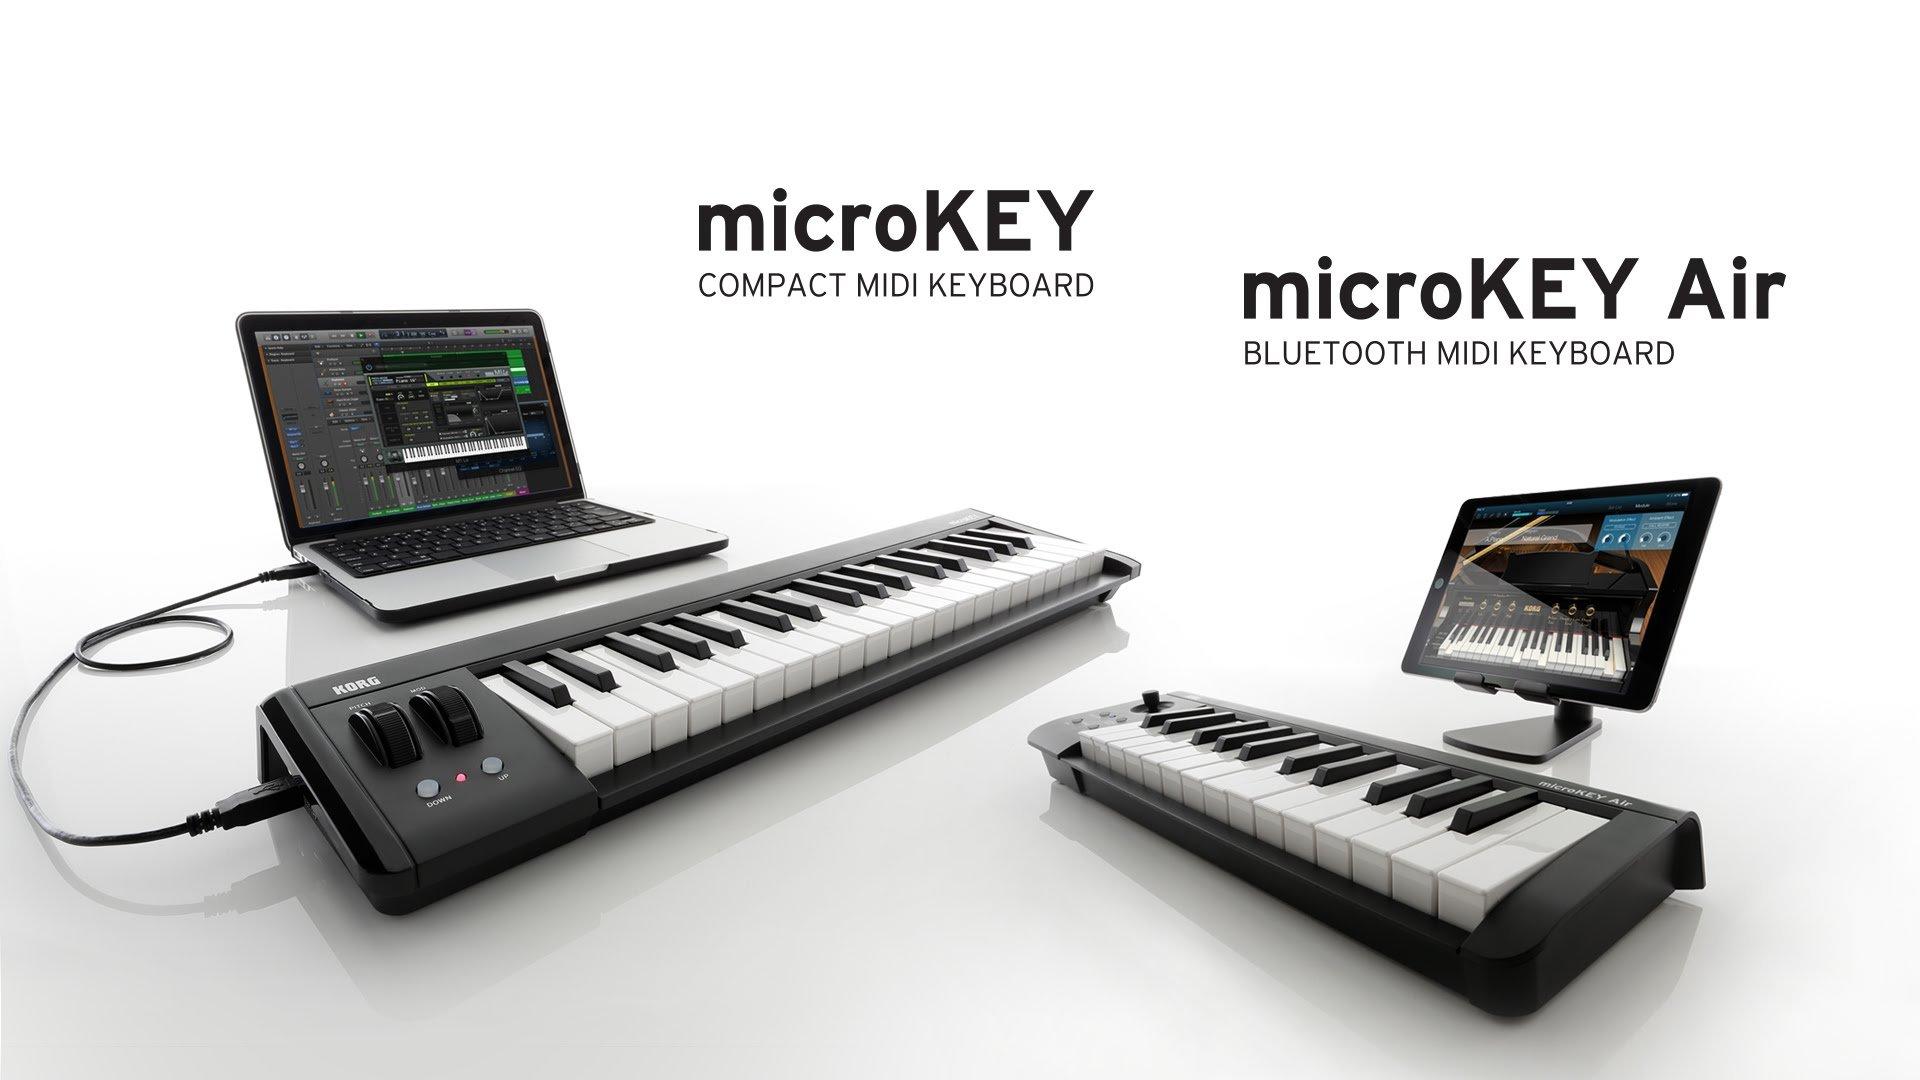 KORG microKEY2 49-Key iOS-Powerable USB MIDI Micro Keyboard Controller - Black by Korg (Image #6)